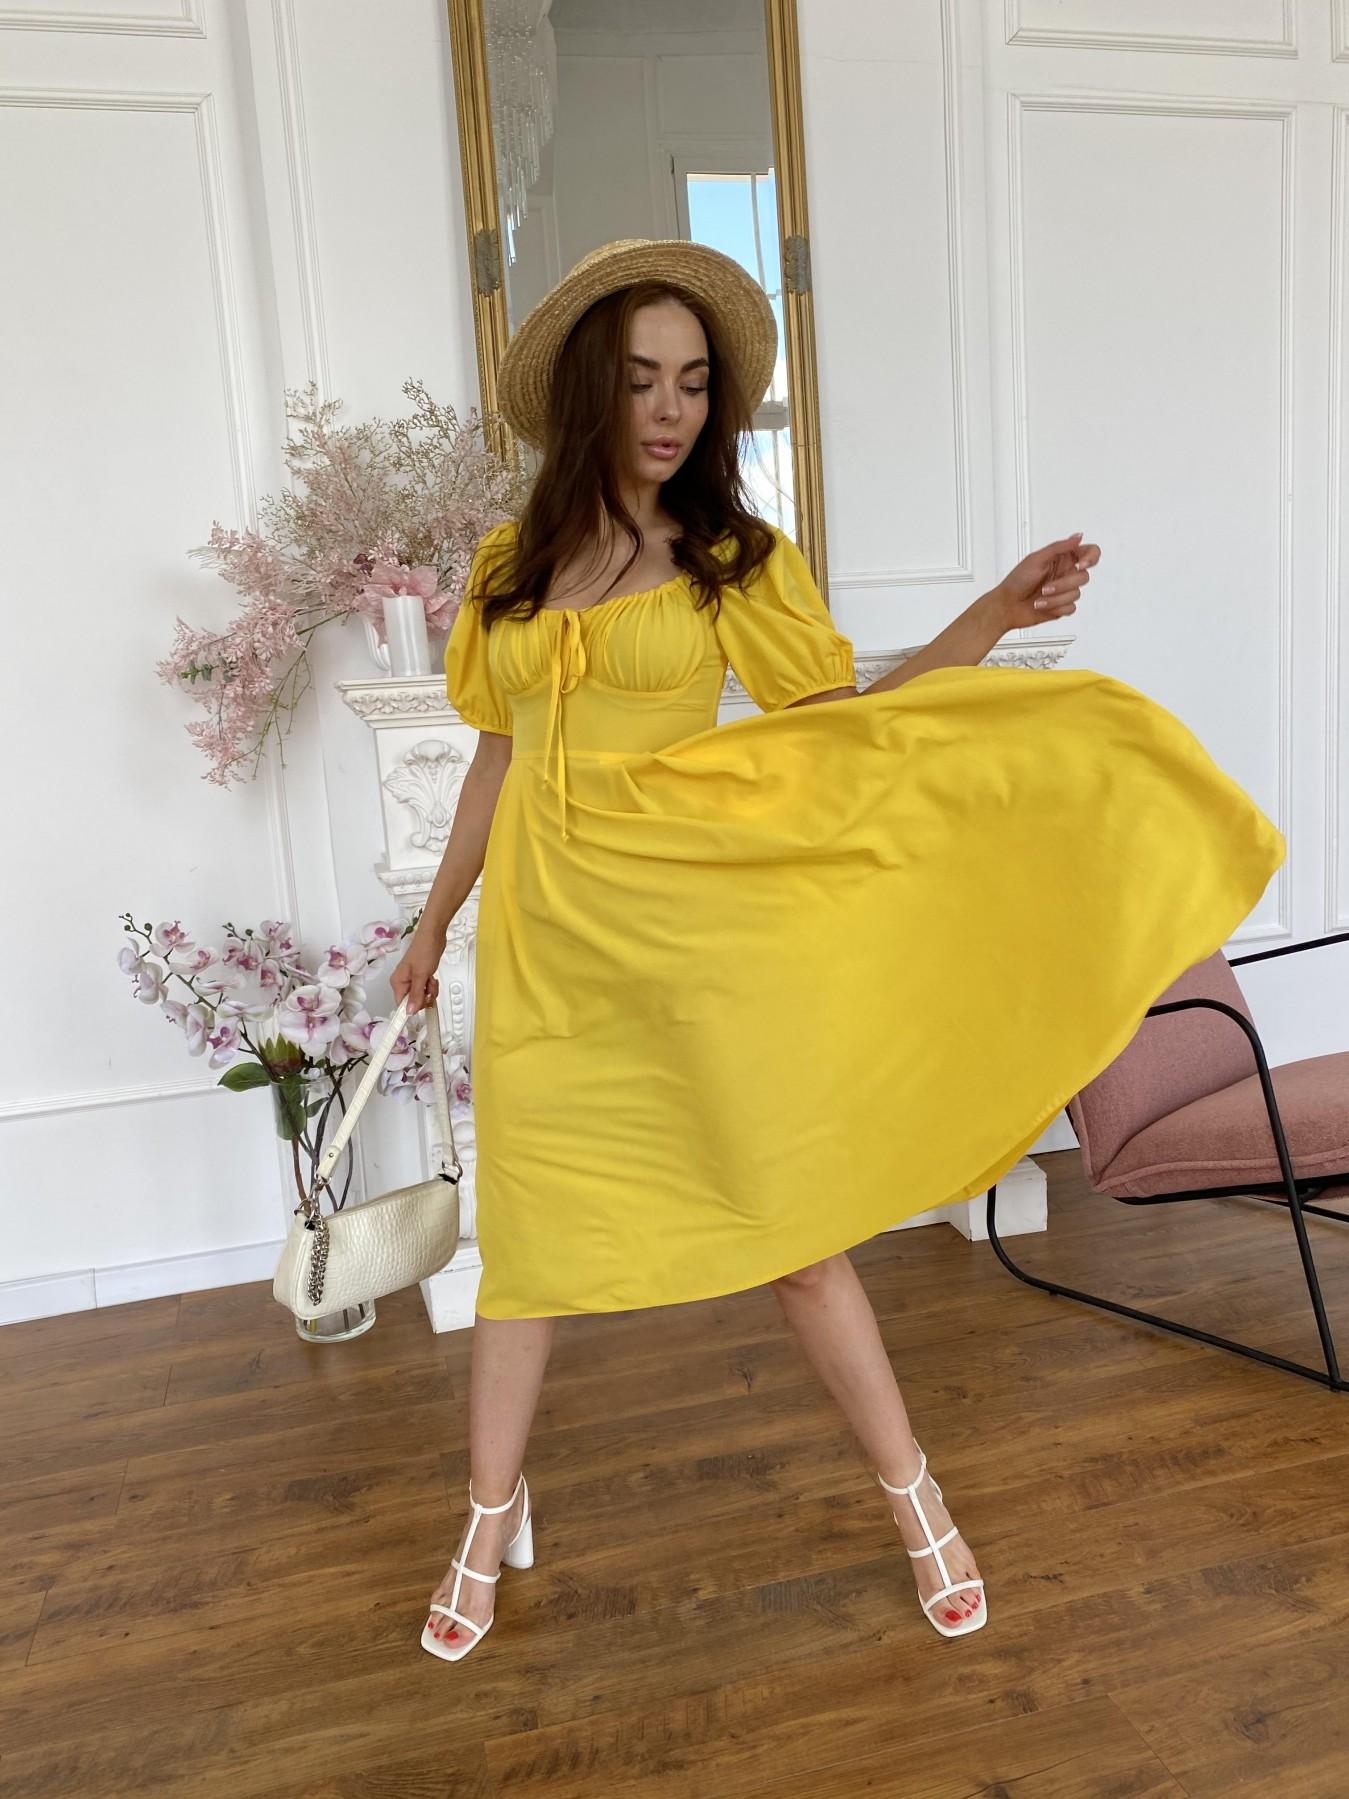 Кисес Миди платье из шифона креп 11443 АРТ. 48205 Цвет: Желтый 14 - фото 2, интернет магазин tm-modus.ru